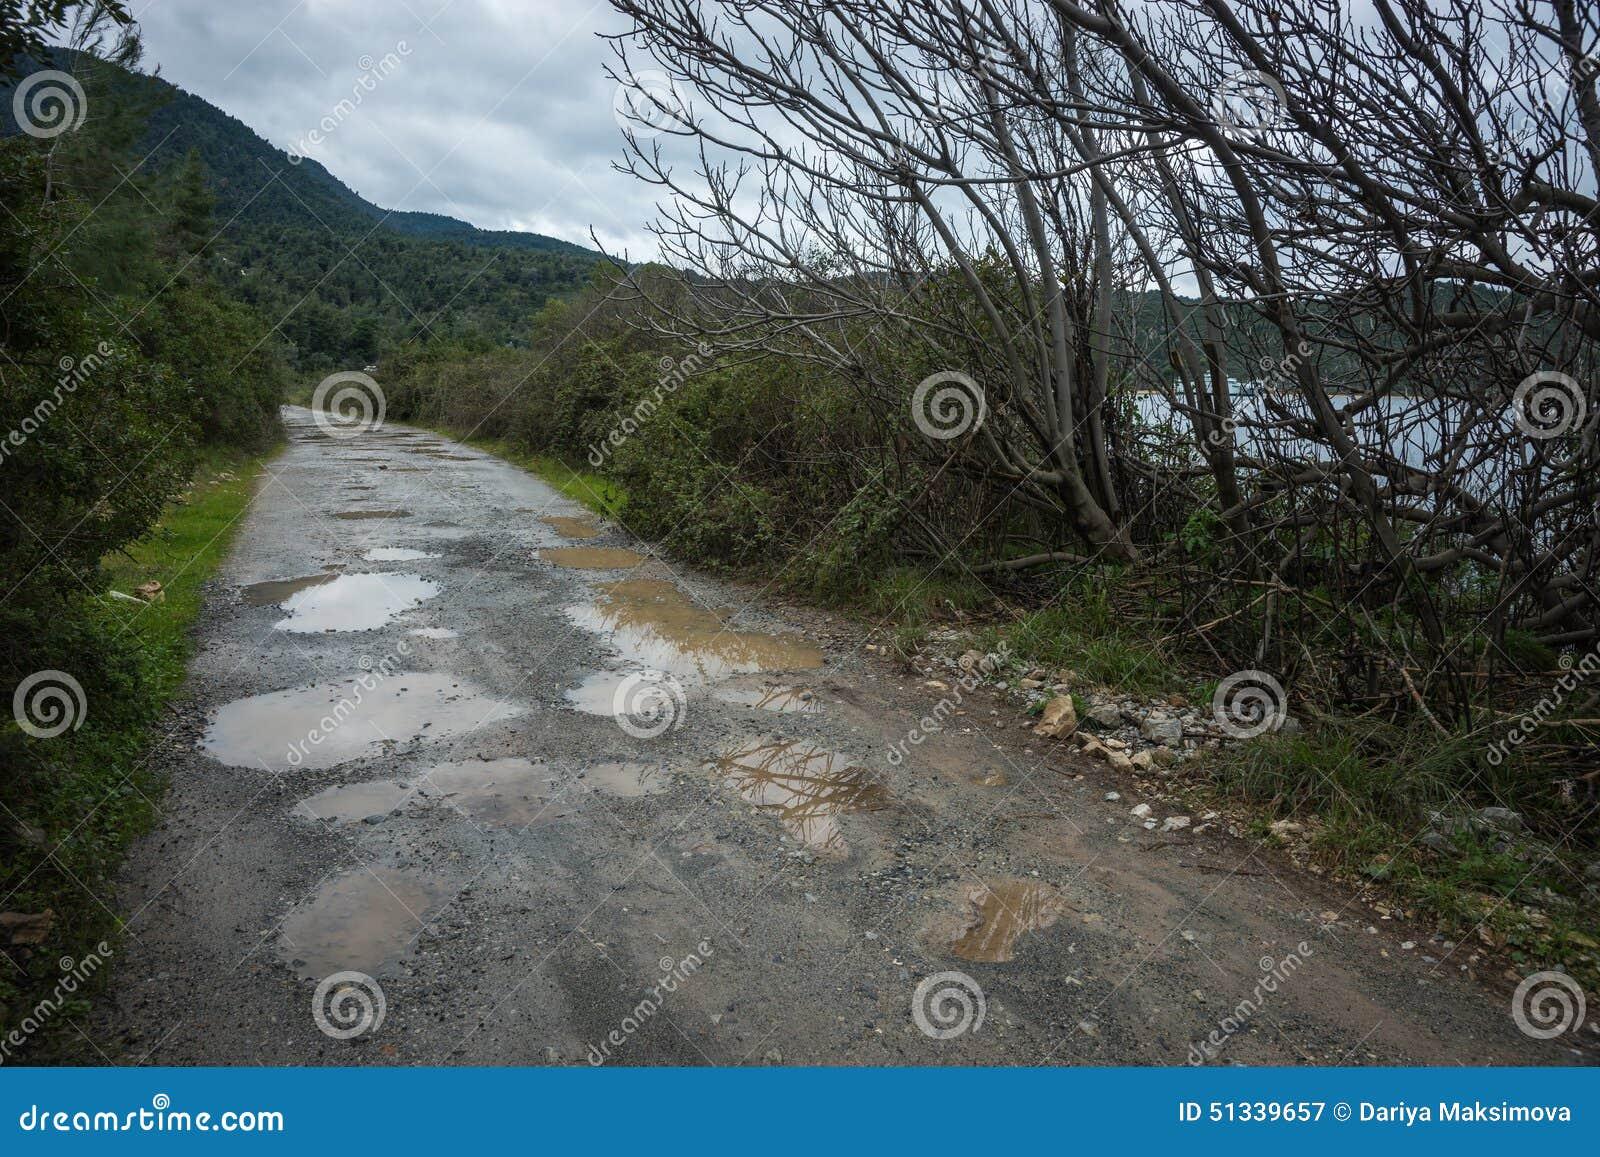 Spring roads after heavy rain Rain